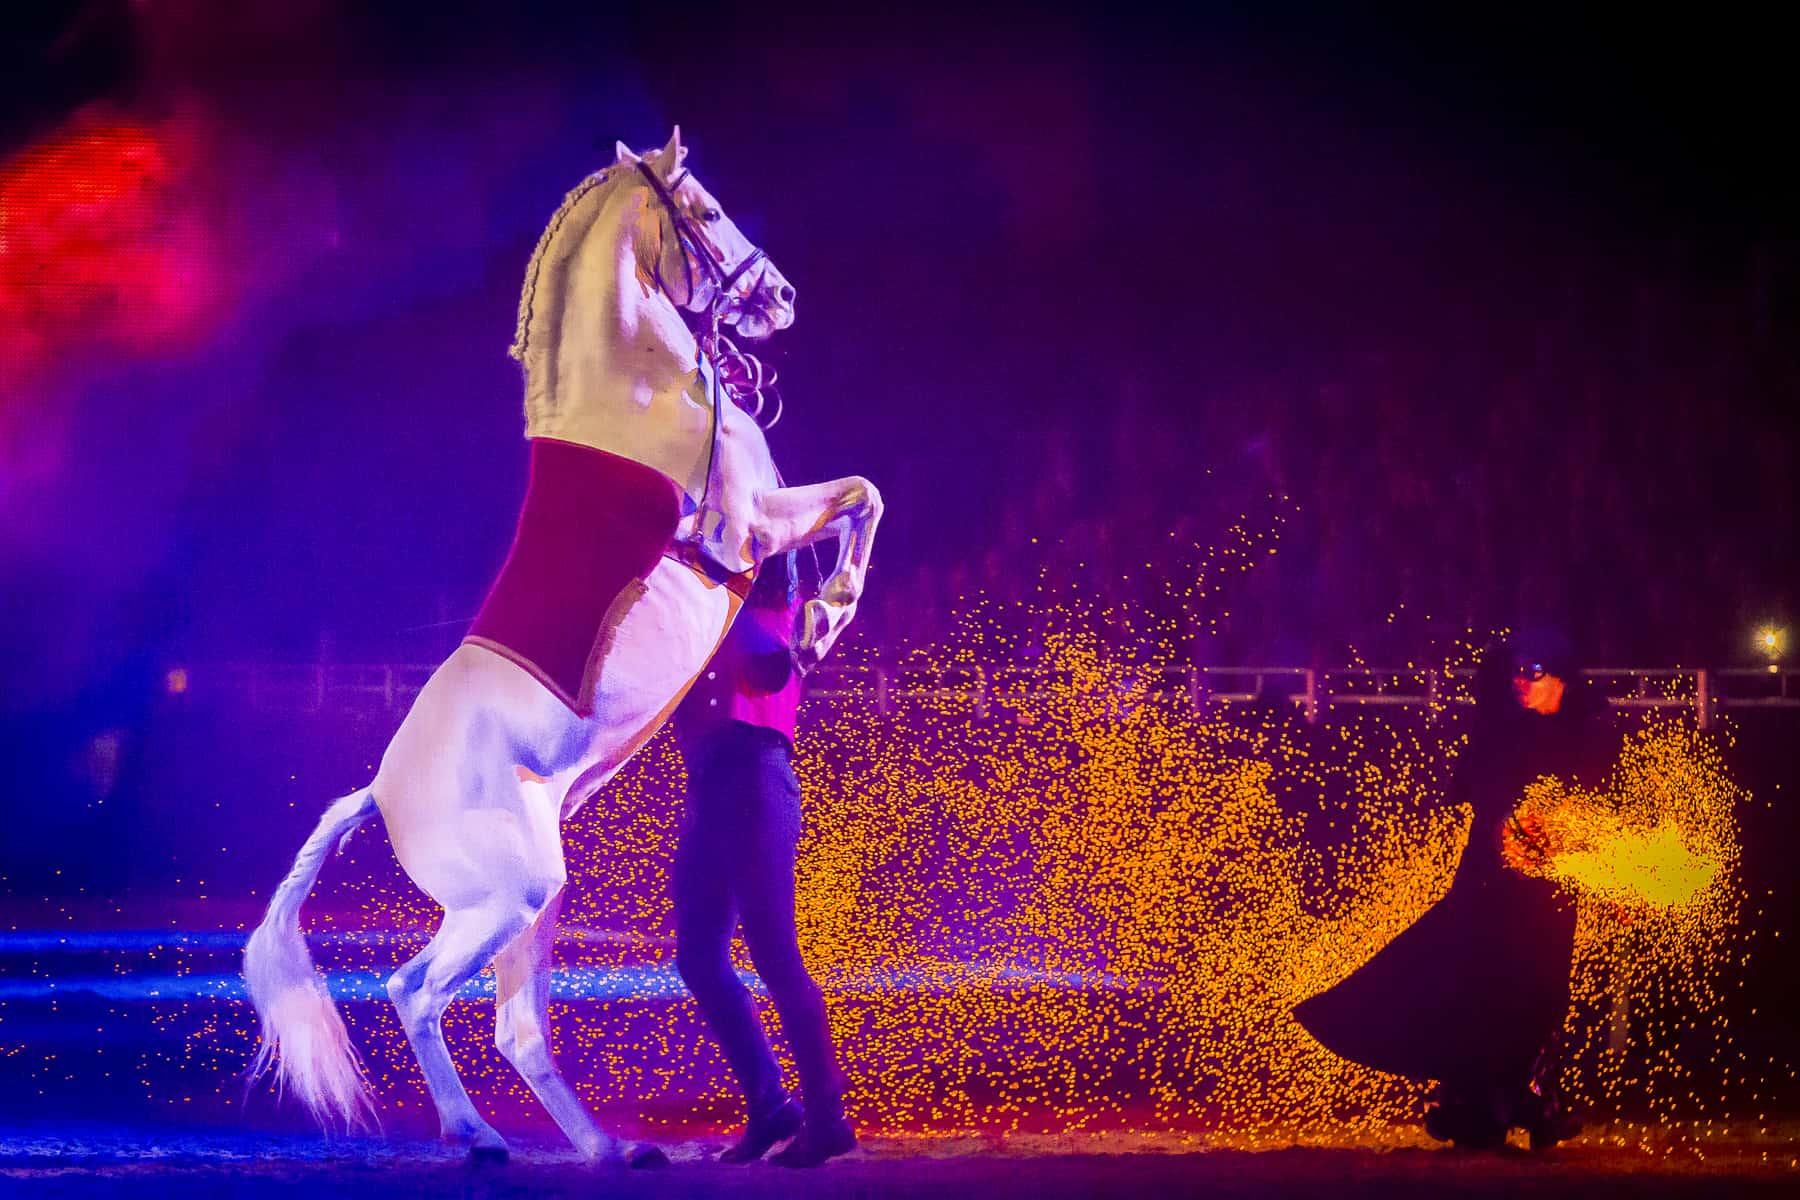 excalibur_horsehowscCh.Slawik-Wuerzburg-Germany-.jpg